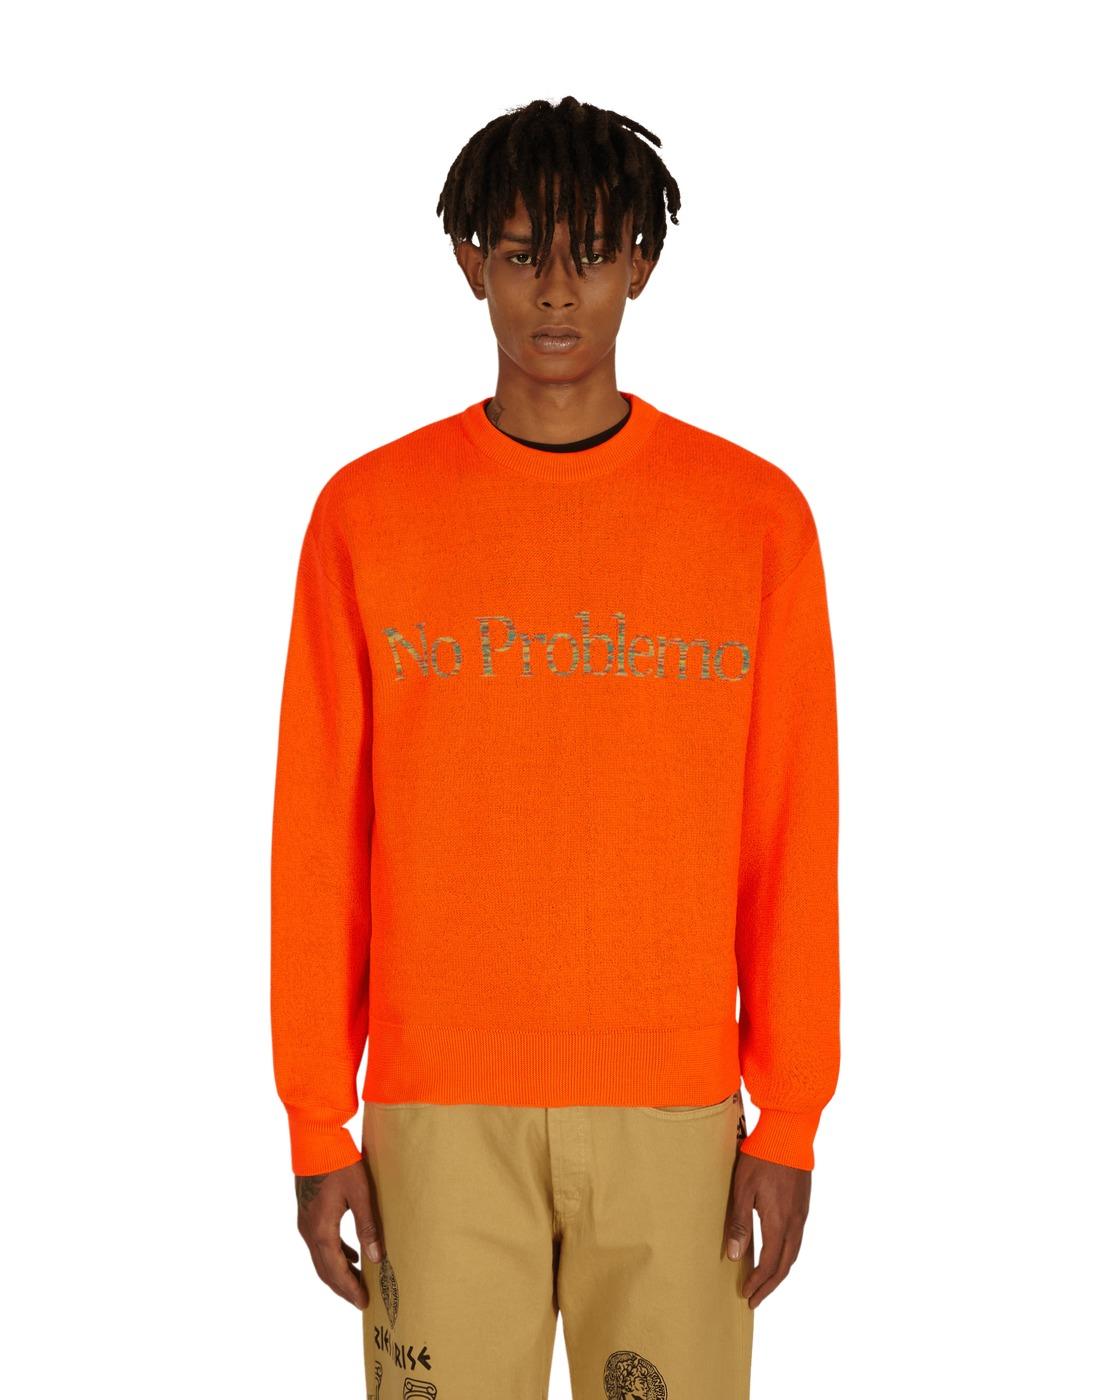 Photo: Aries Space Dye No Problemo Knit Sweater Orange